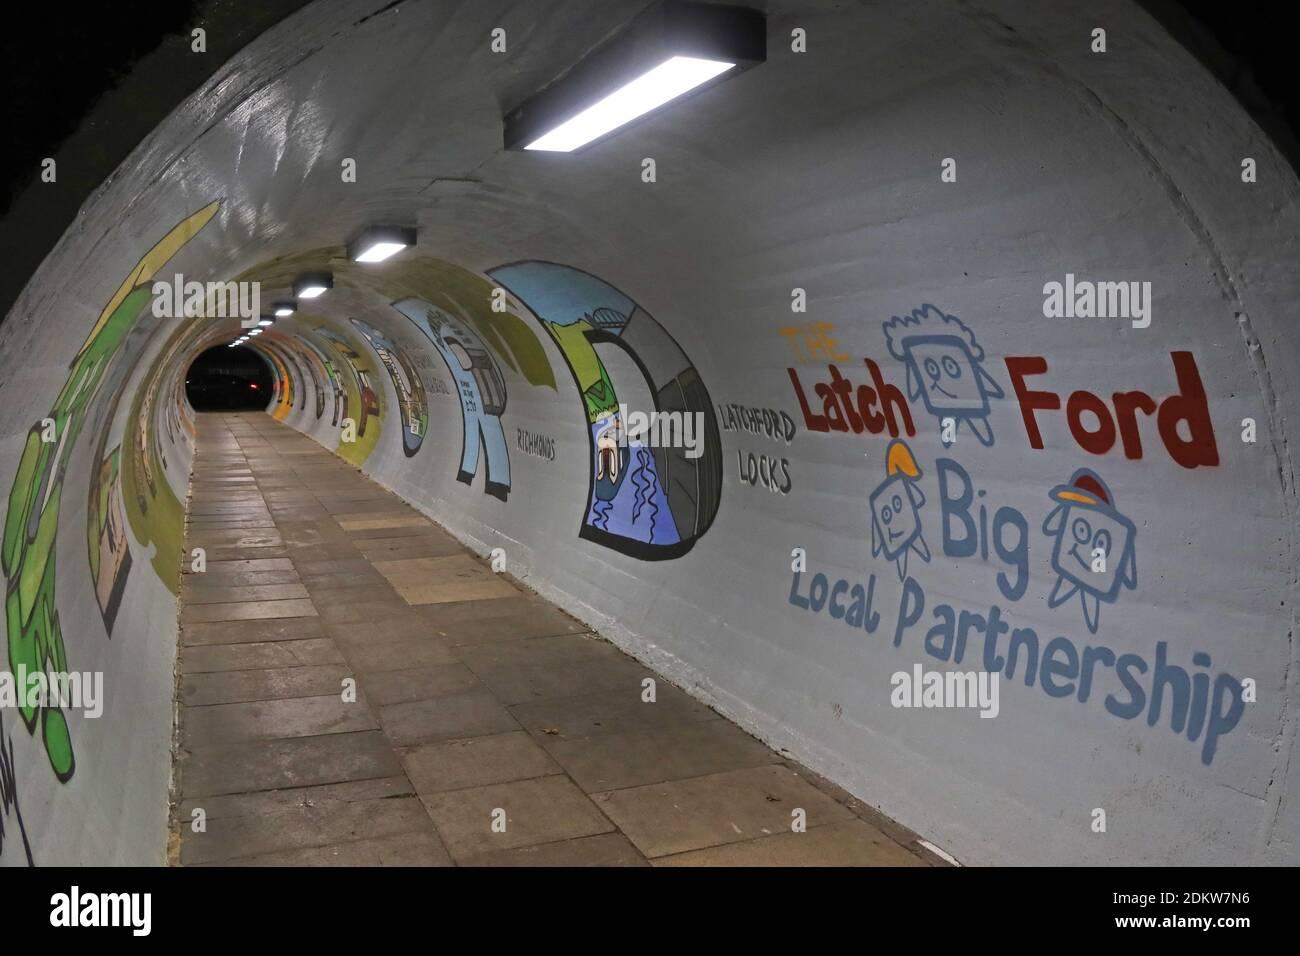 @HotpixUK,HotpixUK,GoTonySmith,Latchy,Cheshire,England,UK,WA4,community,local,dusk,evening,lighting,lights,well lit,safe,LatchfordPartnership,Latchford ward,suburb,residential area,Læccford,boggy-stream ford,Latchford Without,canal,canals,painting,artwork,urban art,Latchford east,Latchford Big Local Partnership